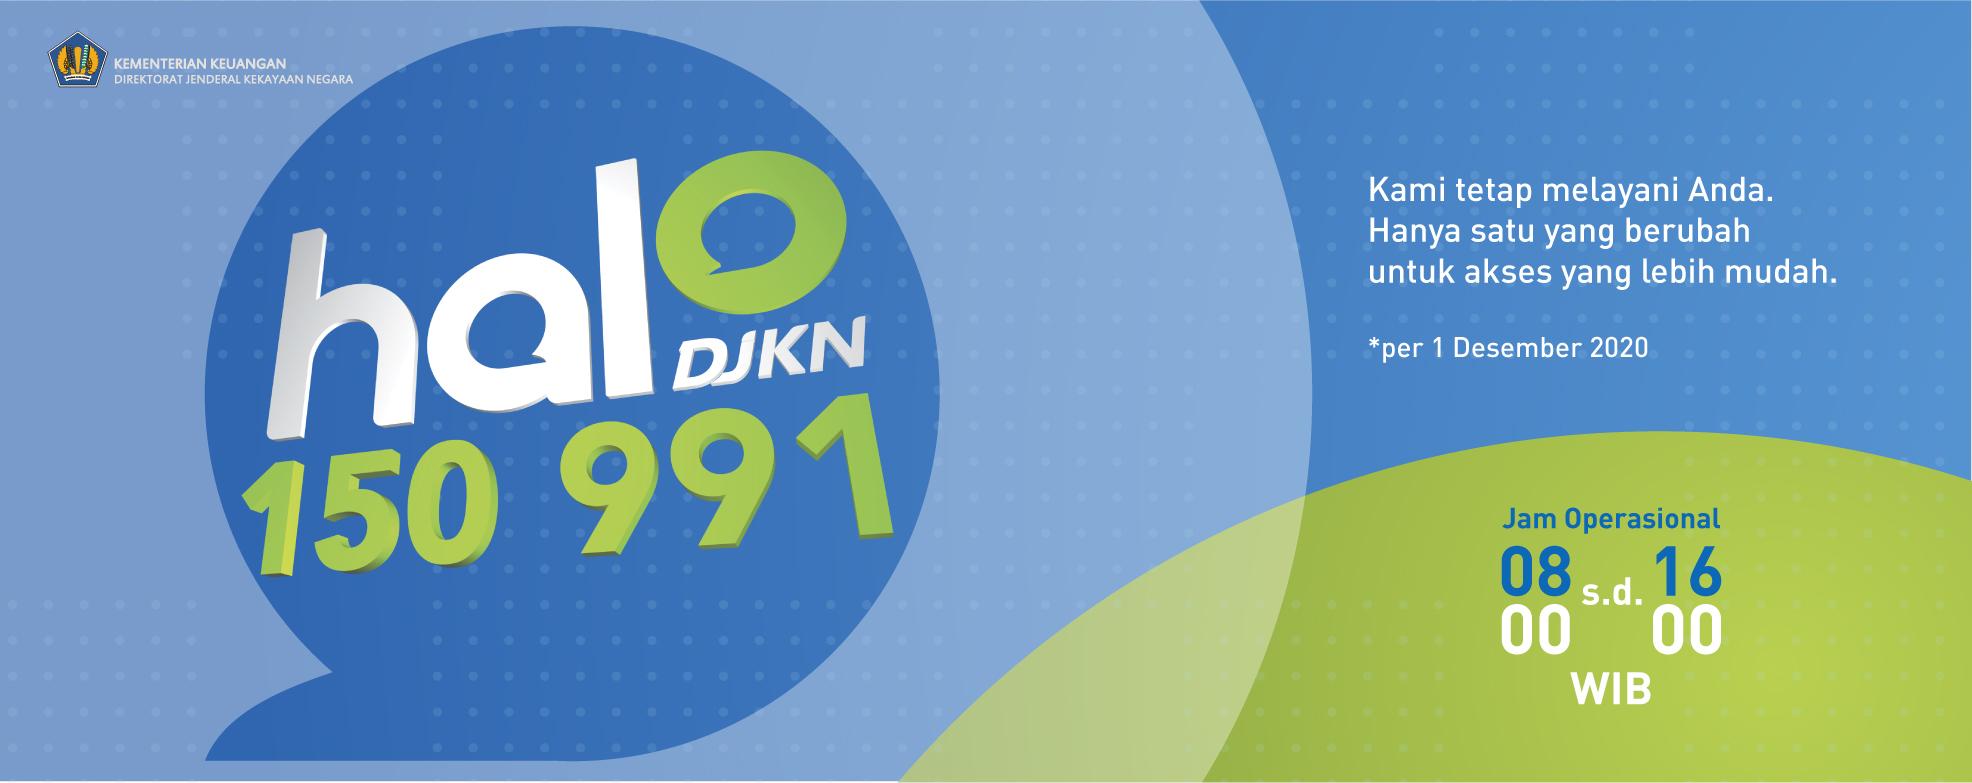 Halo DJKN 150 991